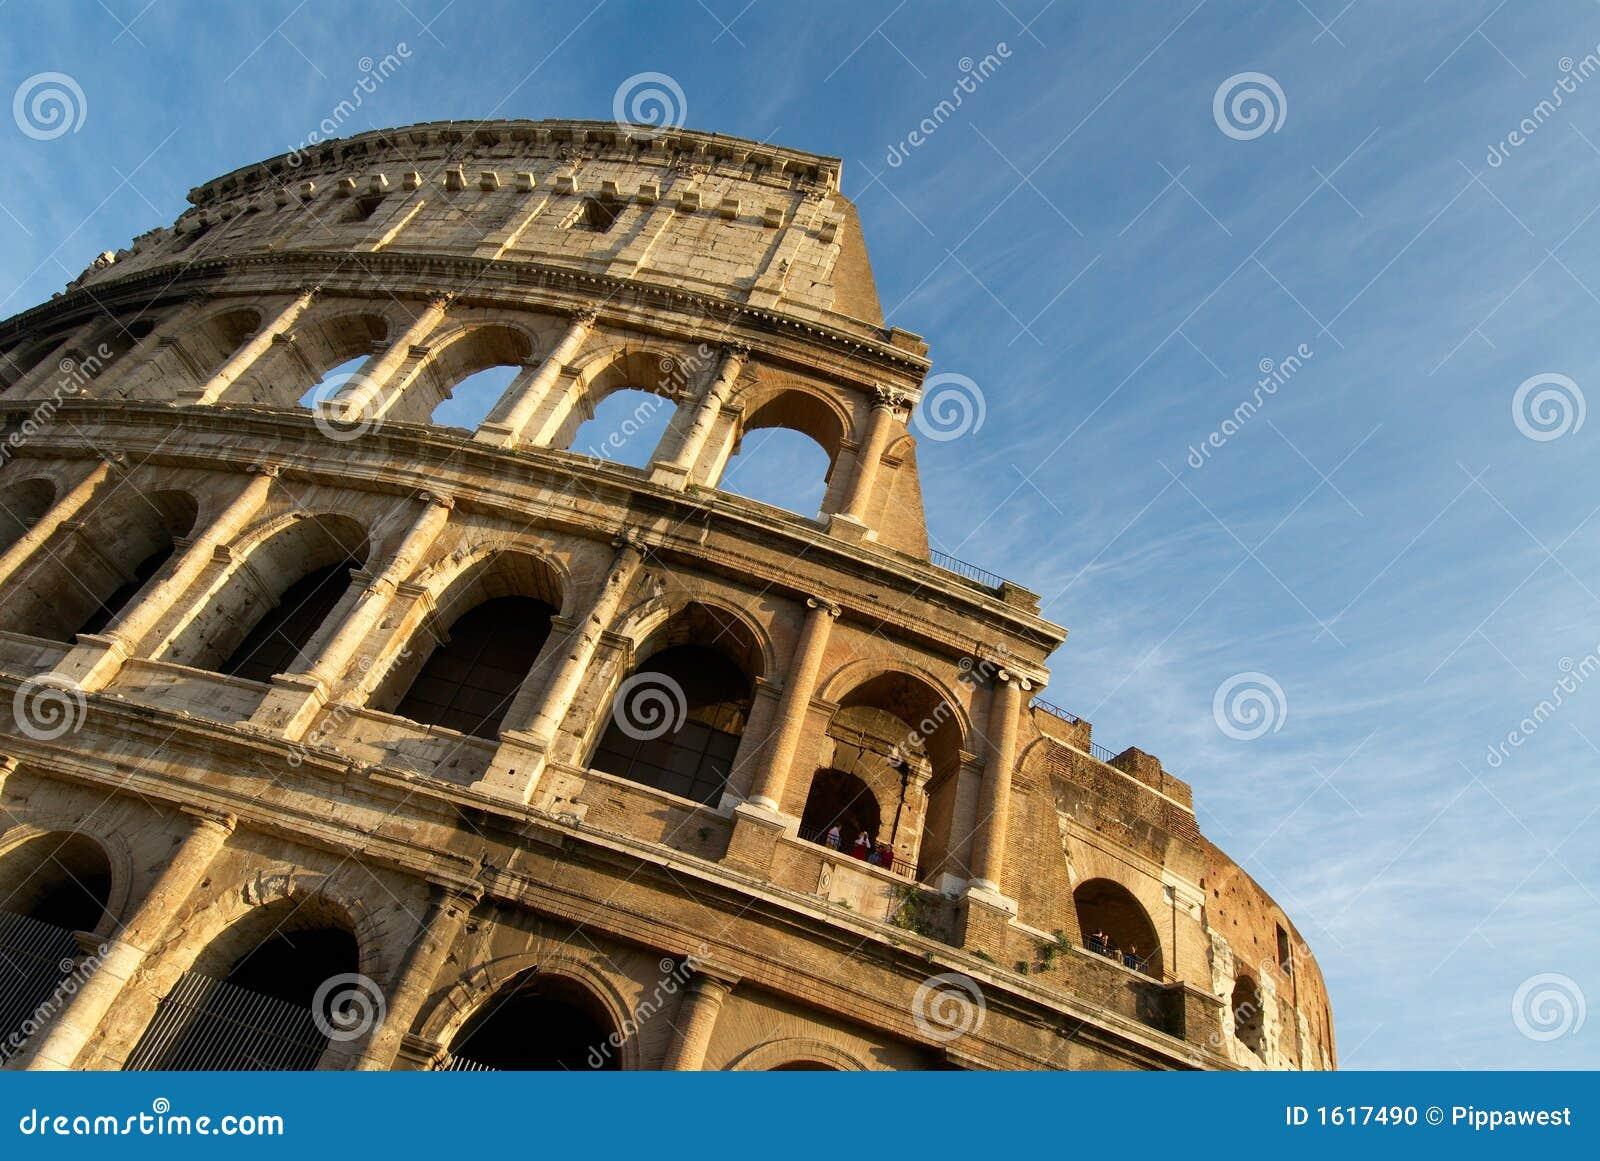 Colosseum одно